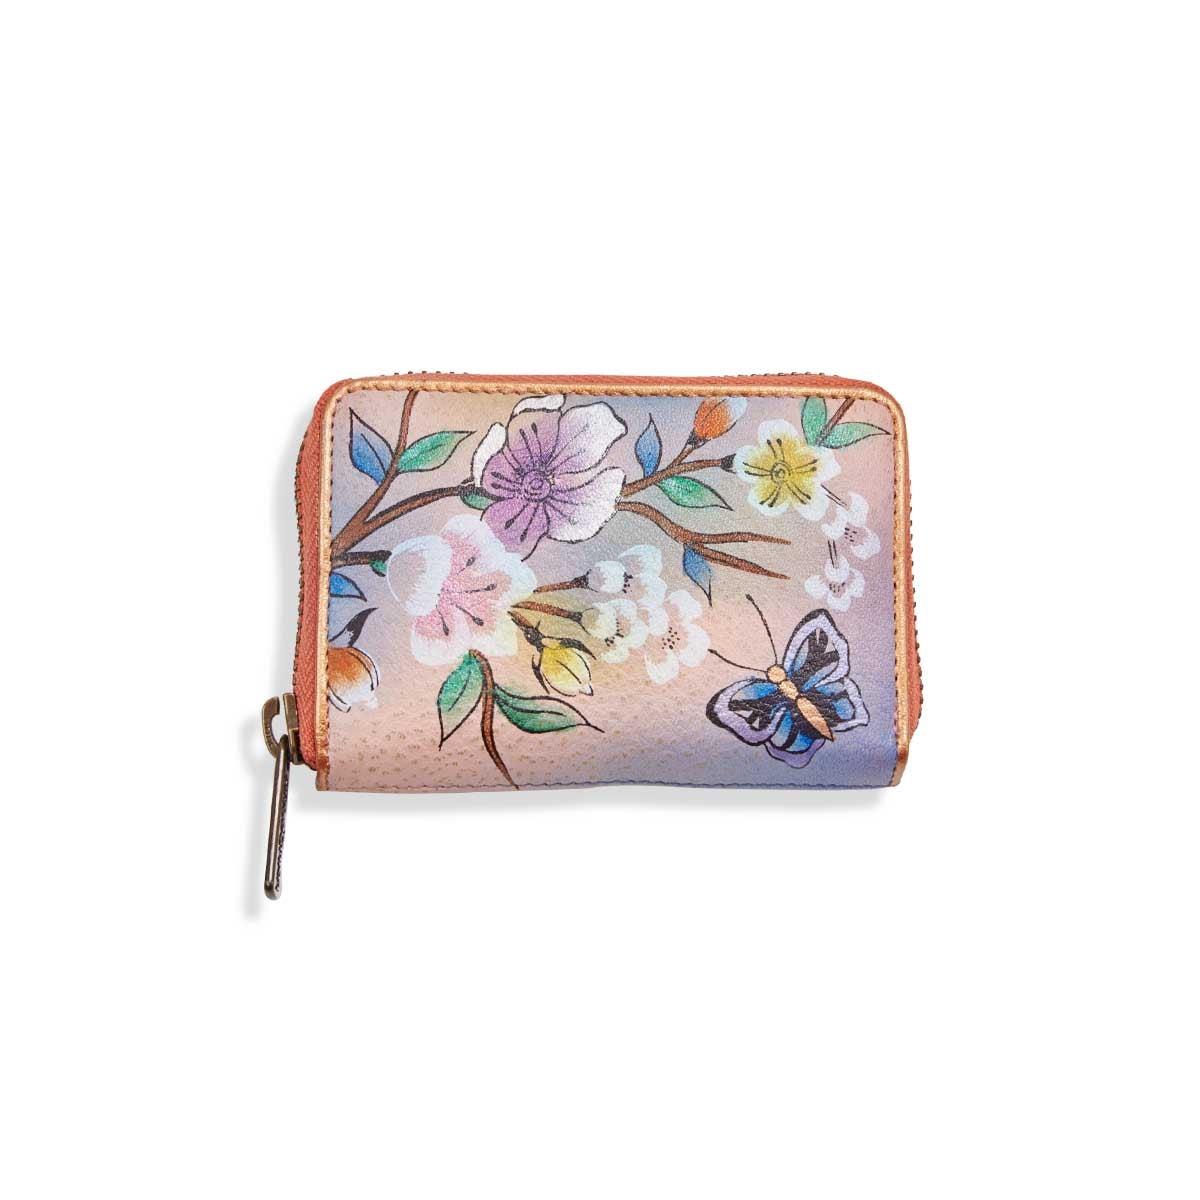 Painted lthr Japanese Garden card holder